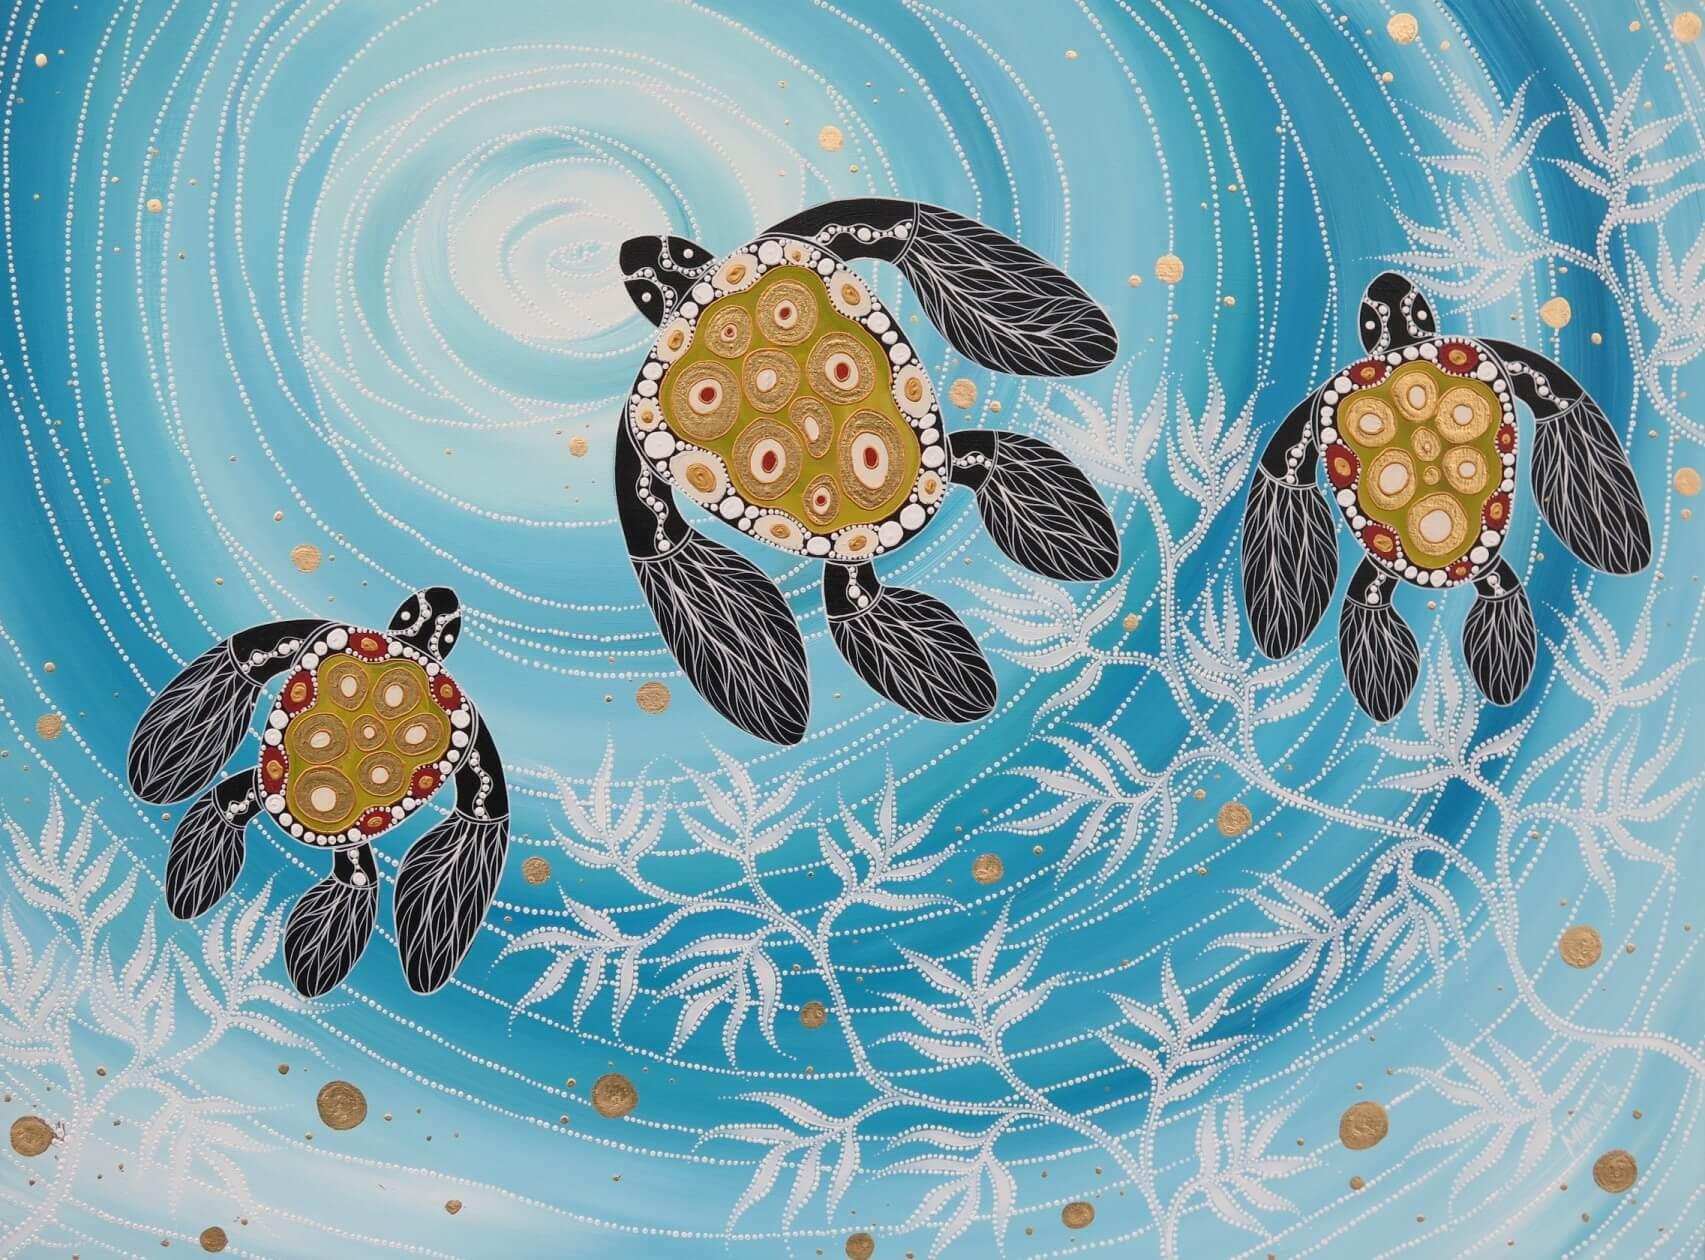 Melanie Hava Turtles Into The Current Artlandish Aboriginal Art